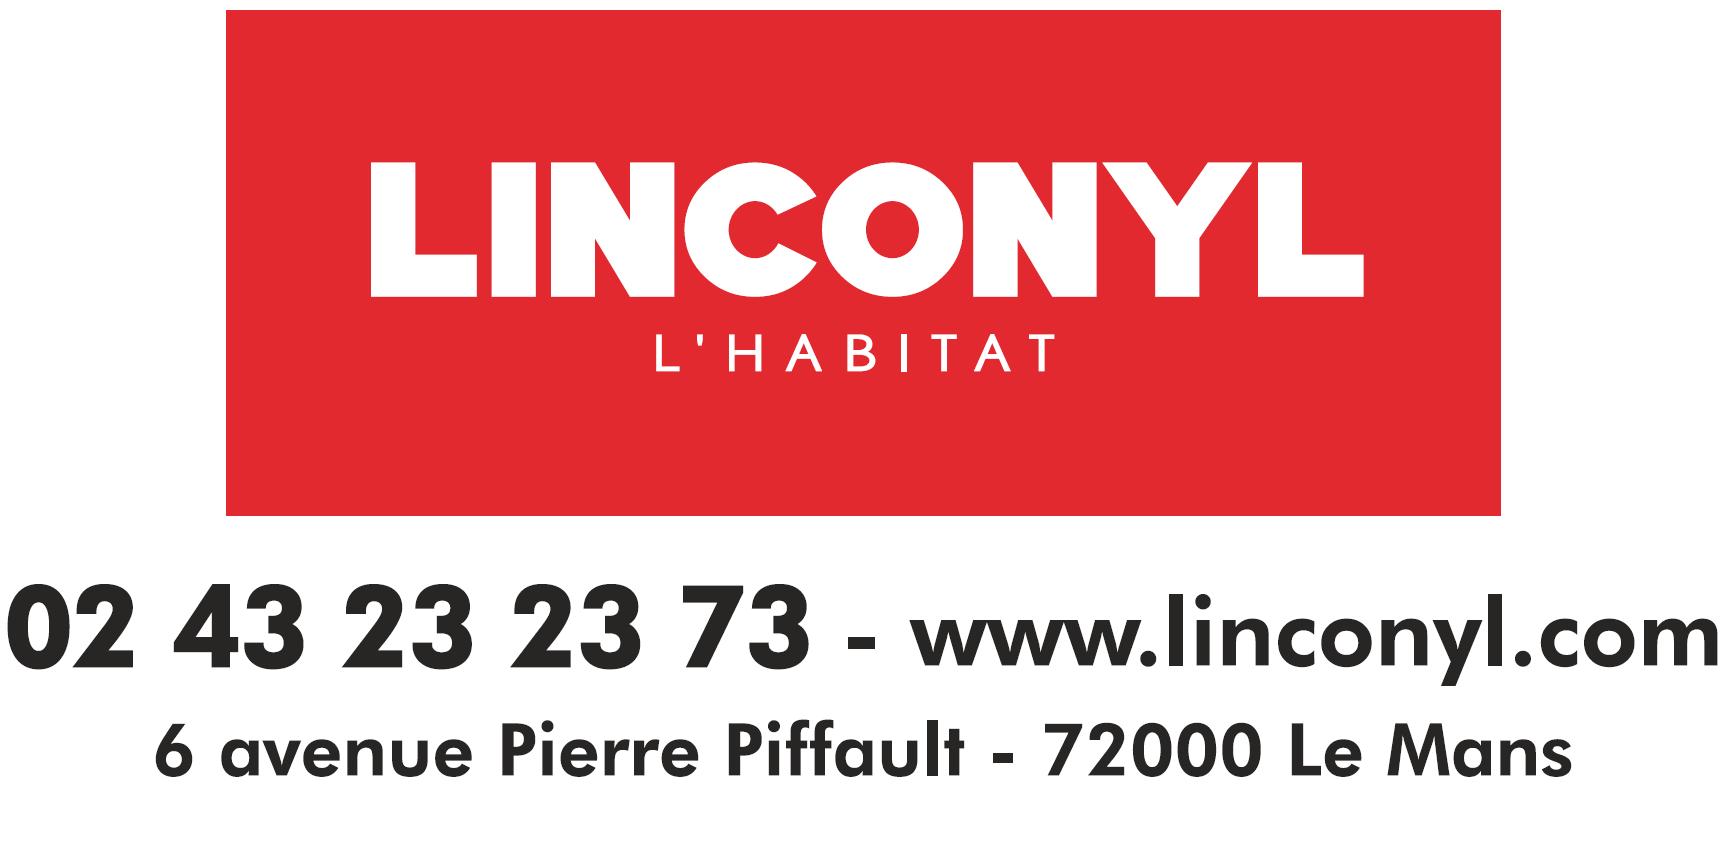 linconyl